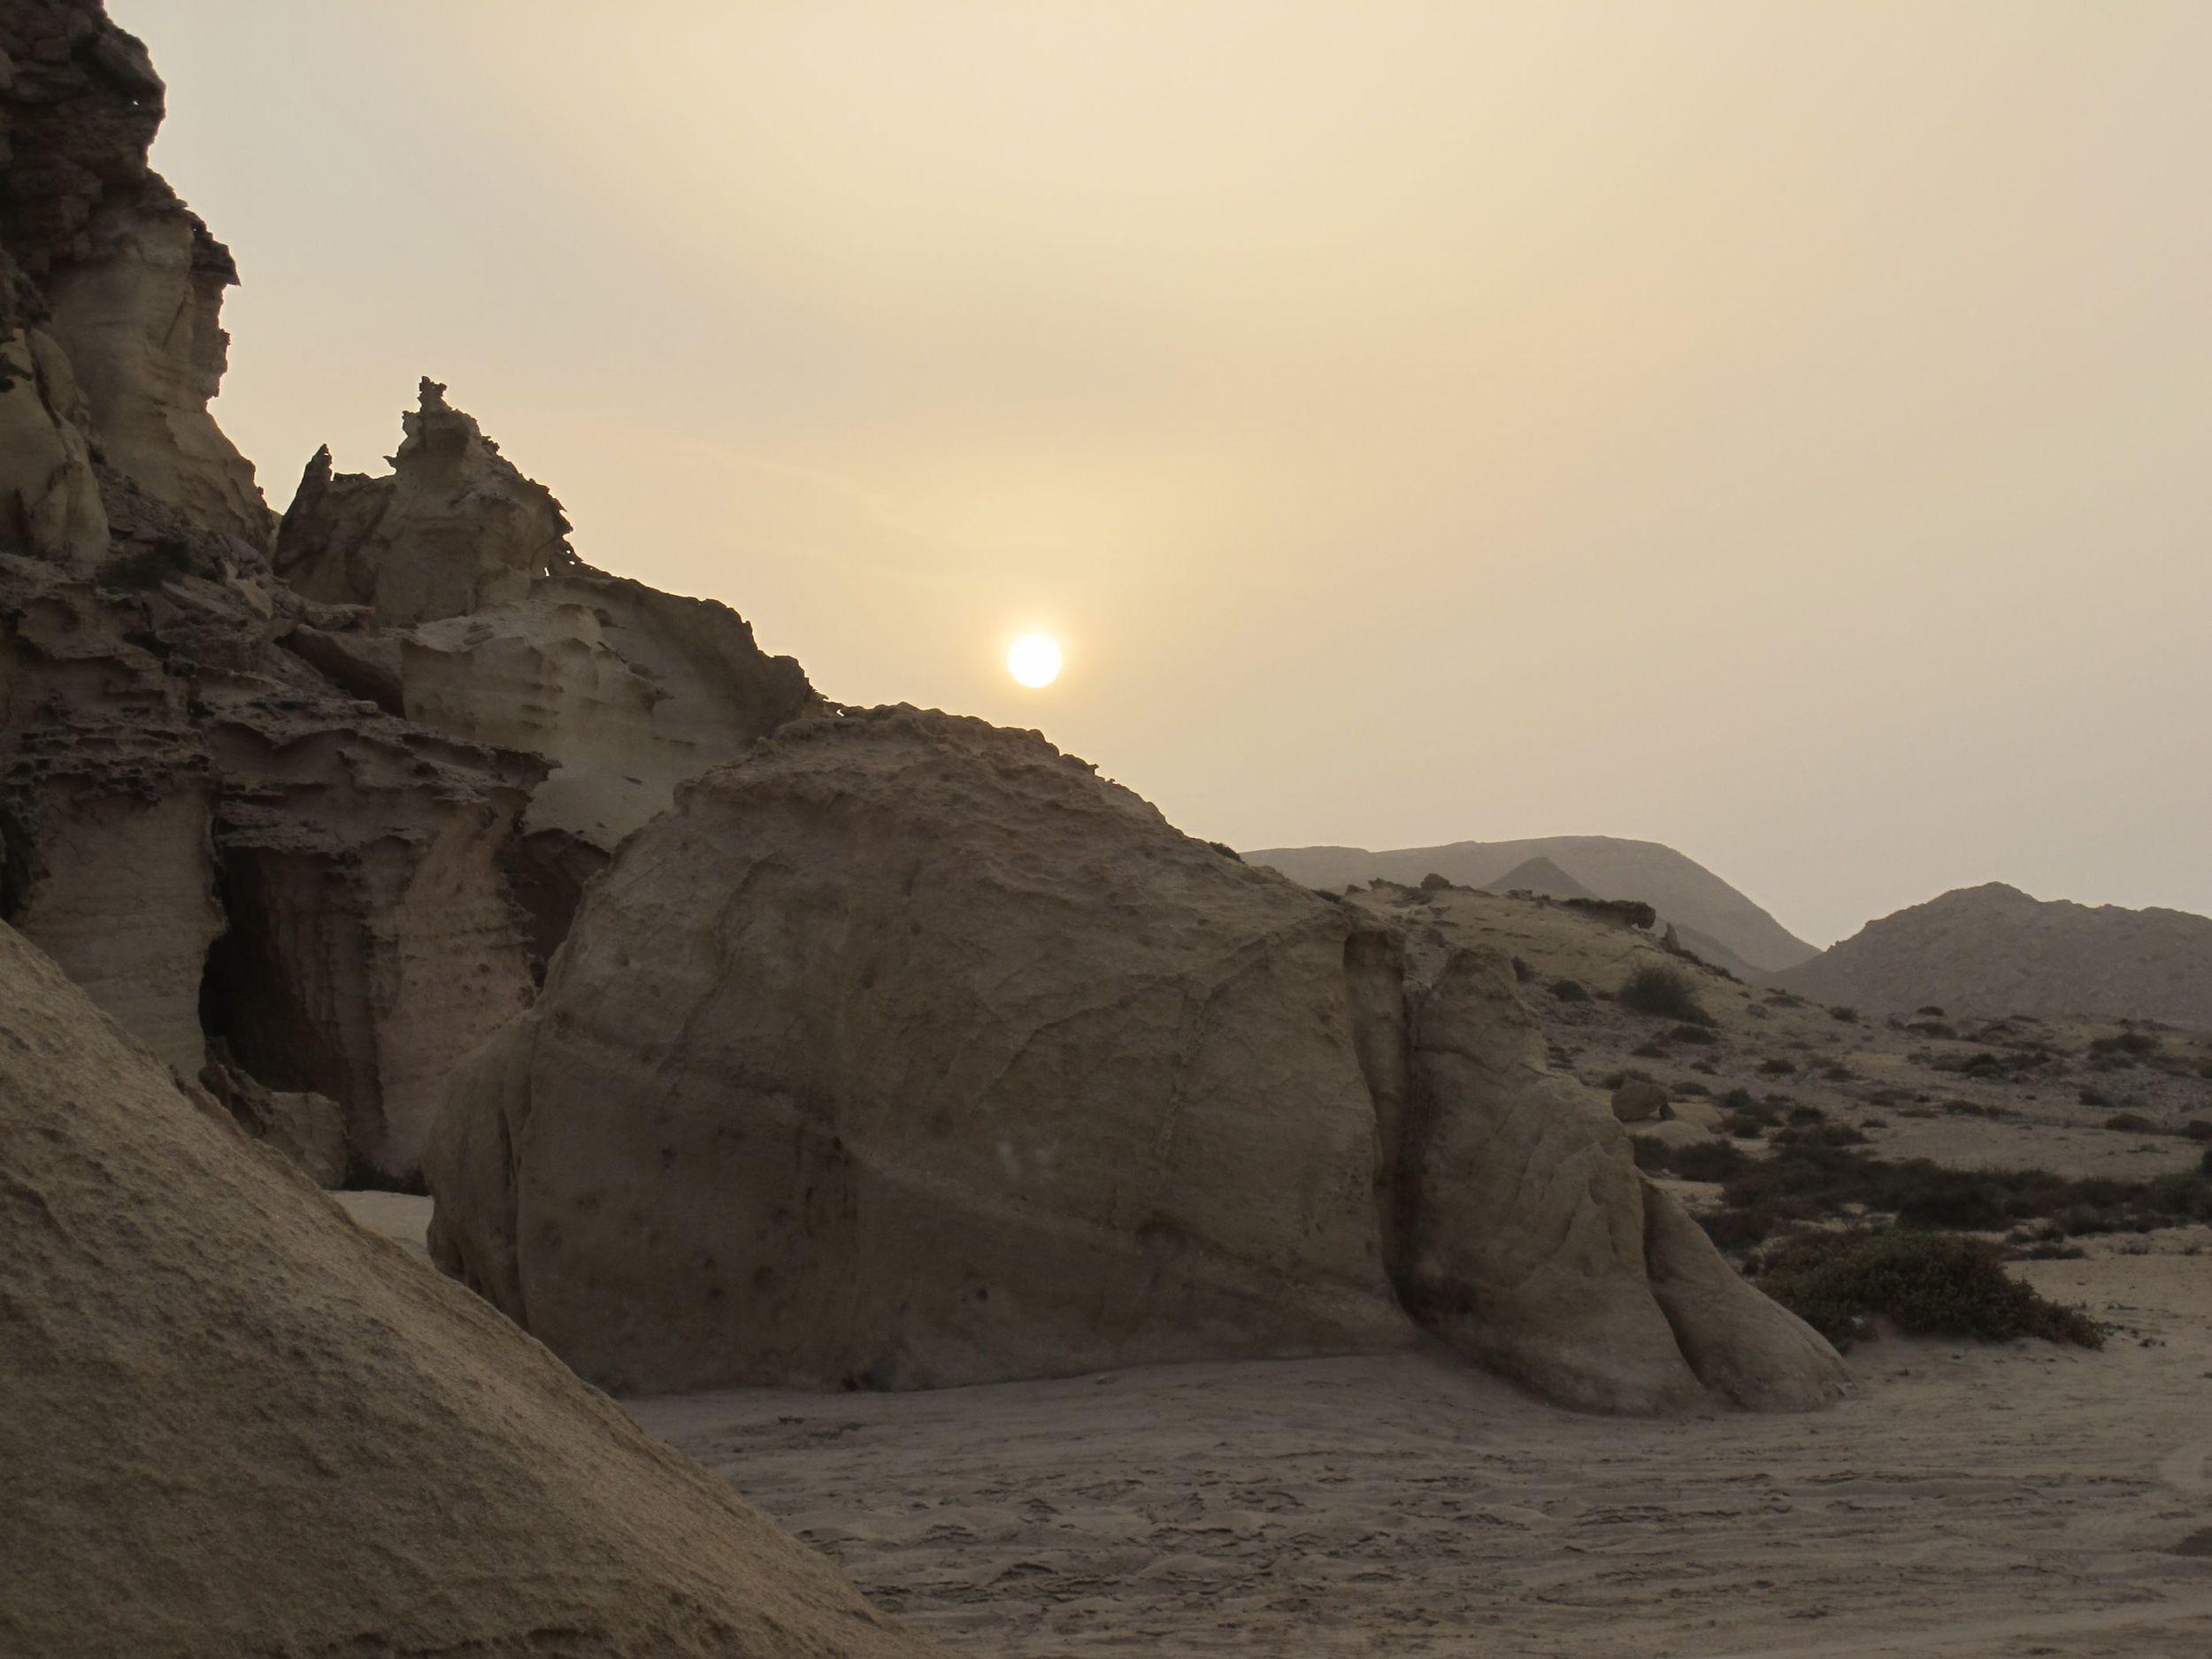 Sunset at Ras Al Jinz